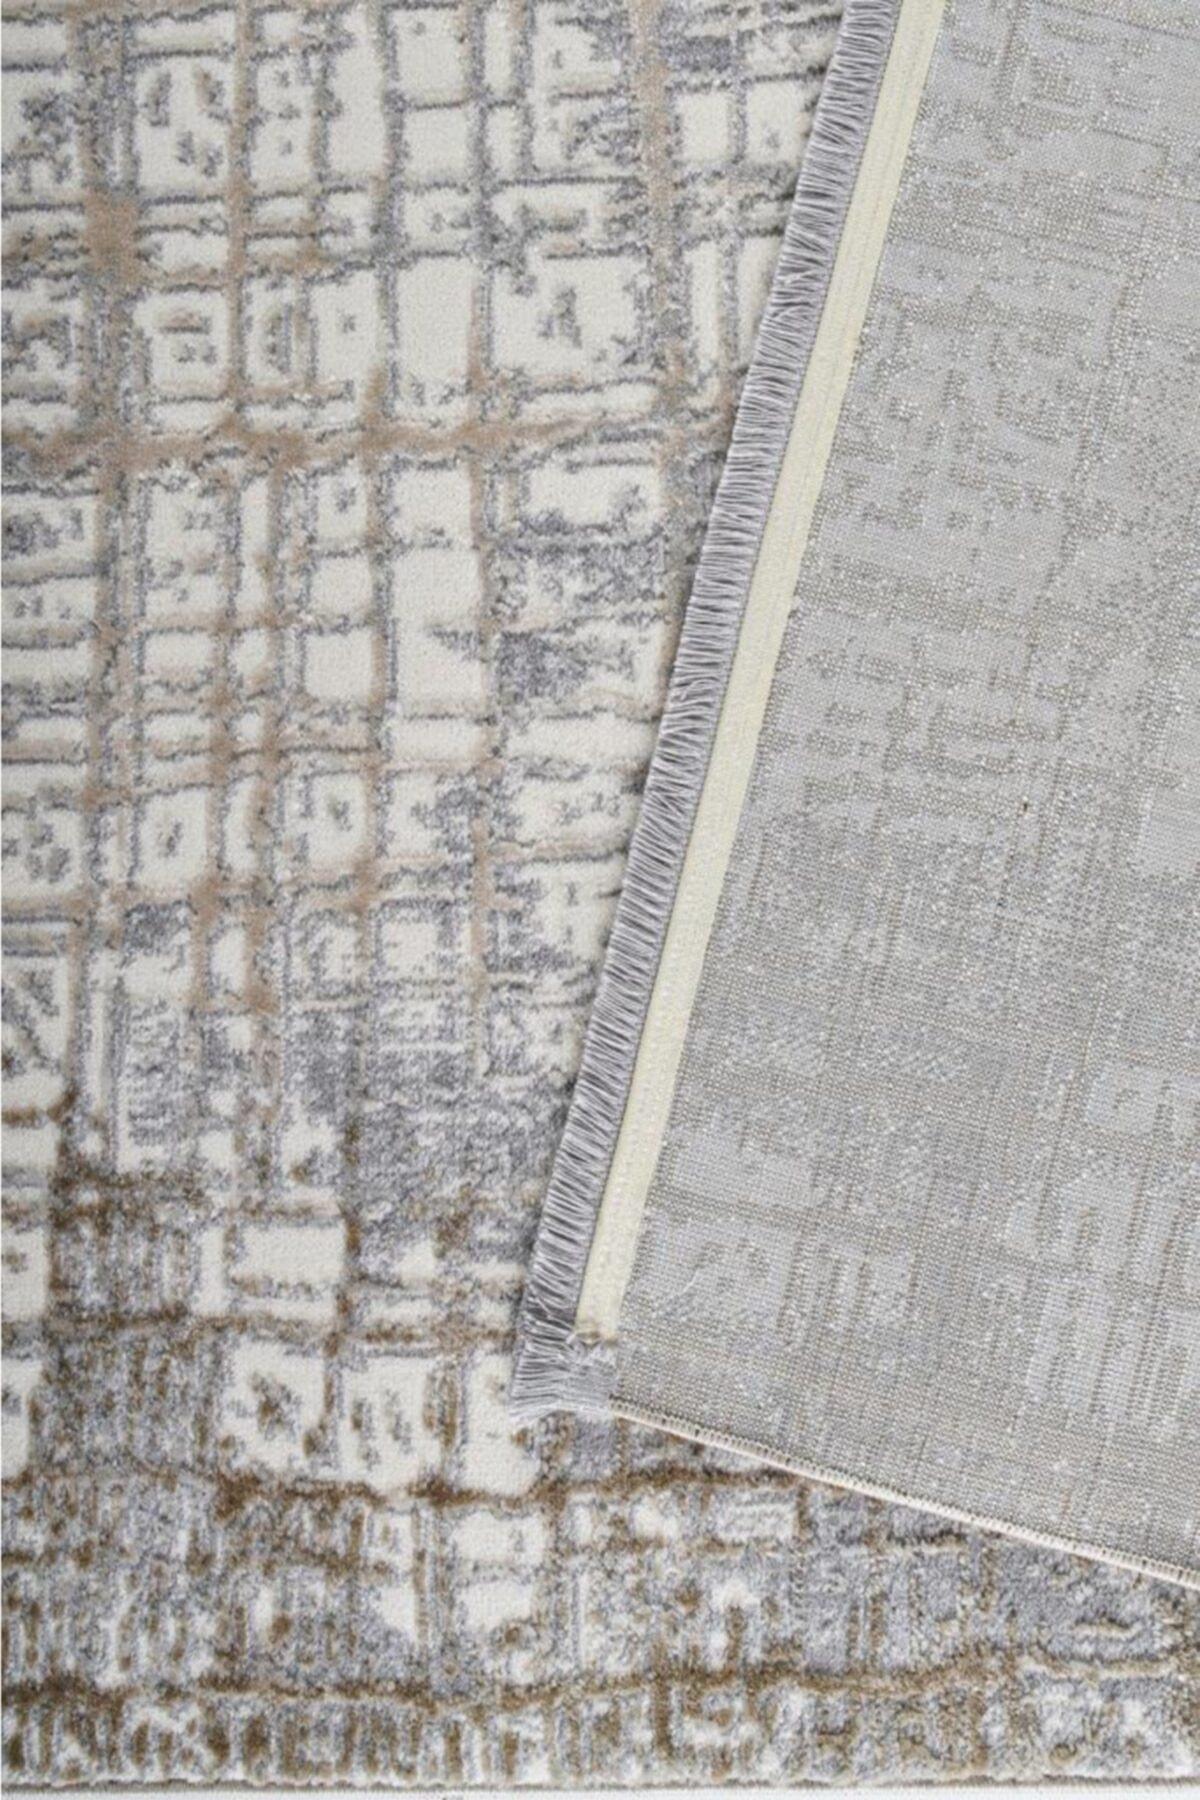 Konfor Halı Konfor Notta 1106 Modern Dokuma Halı